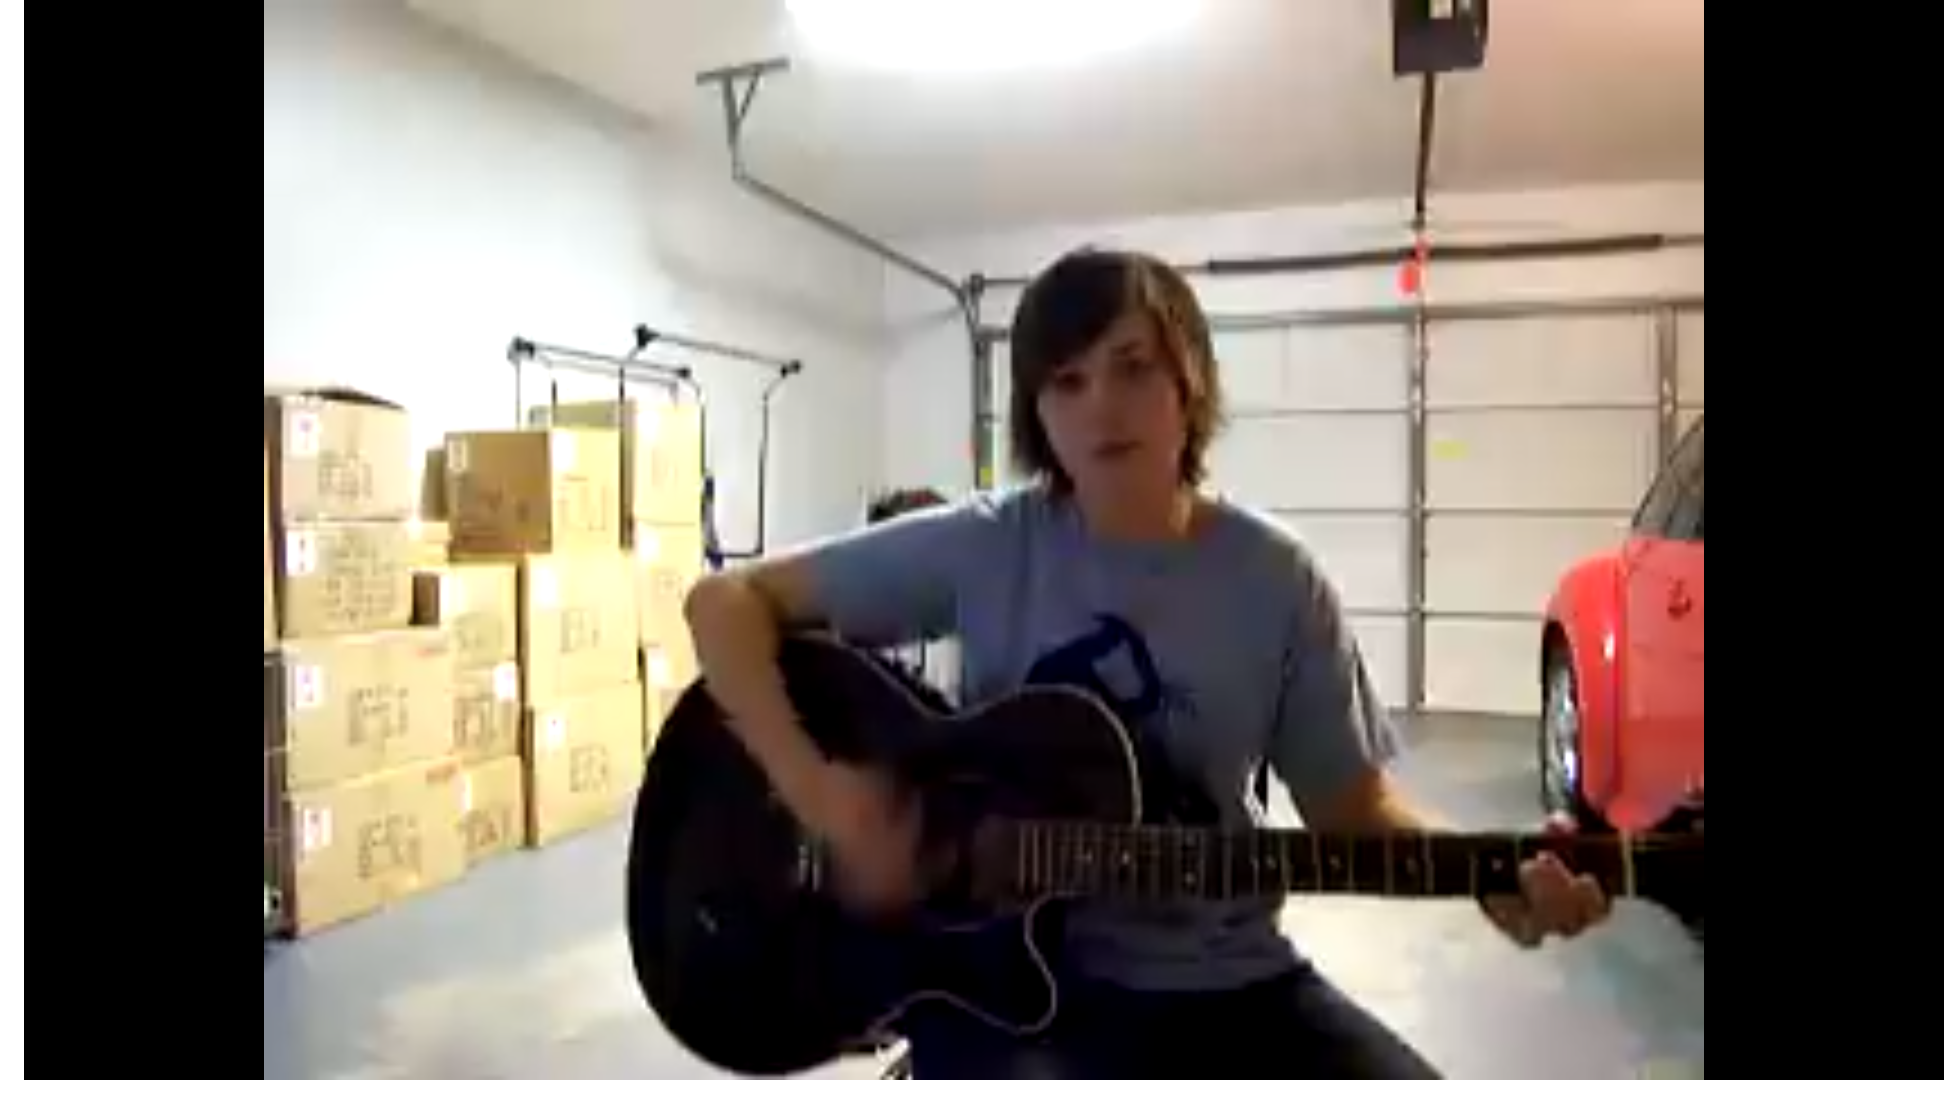 a YouTube screenshot of a too-dark subject